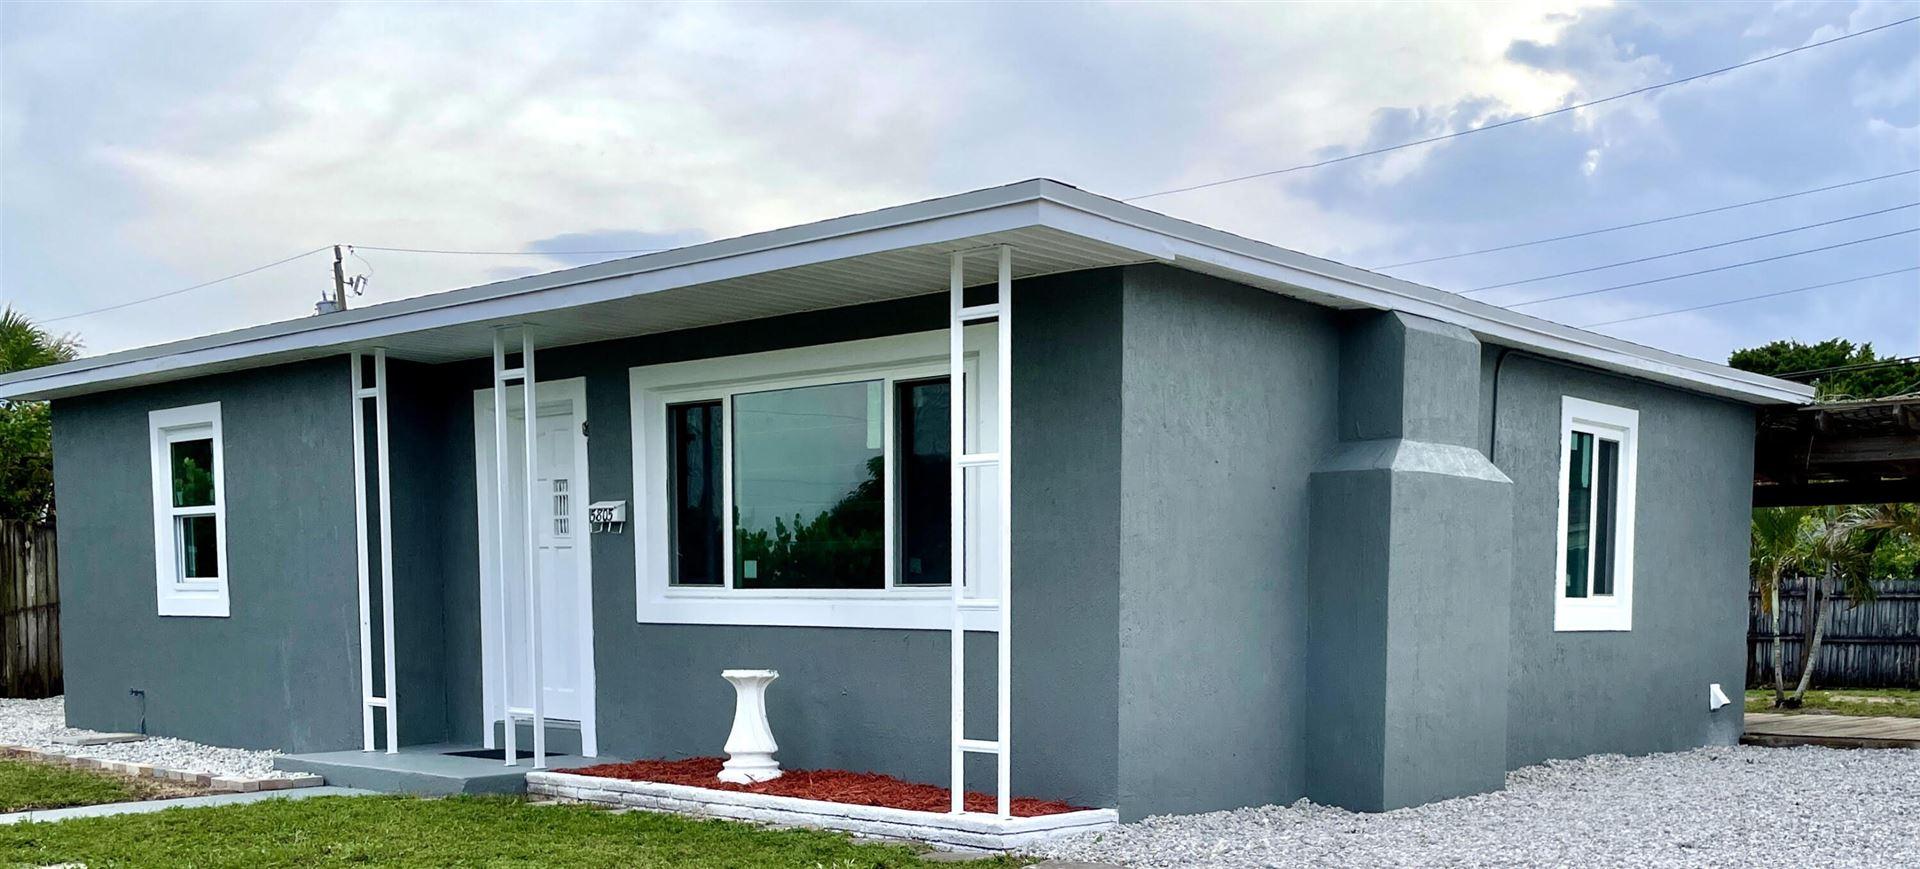 5805 Churchill Court, West Palm Beach, FL 33405 - #: RX-10744133